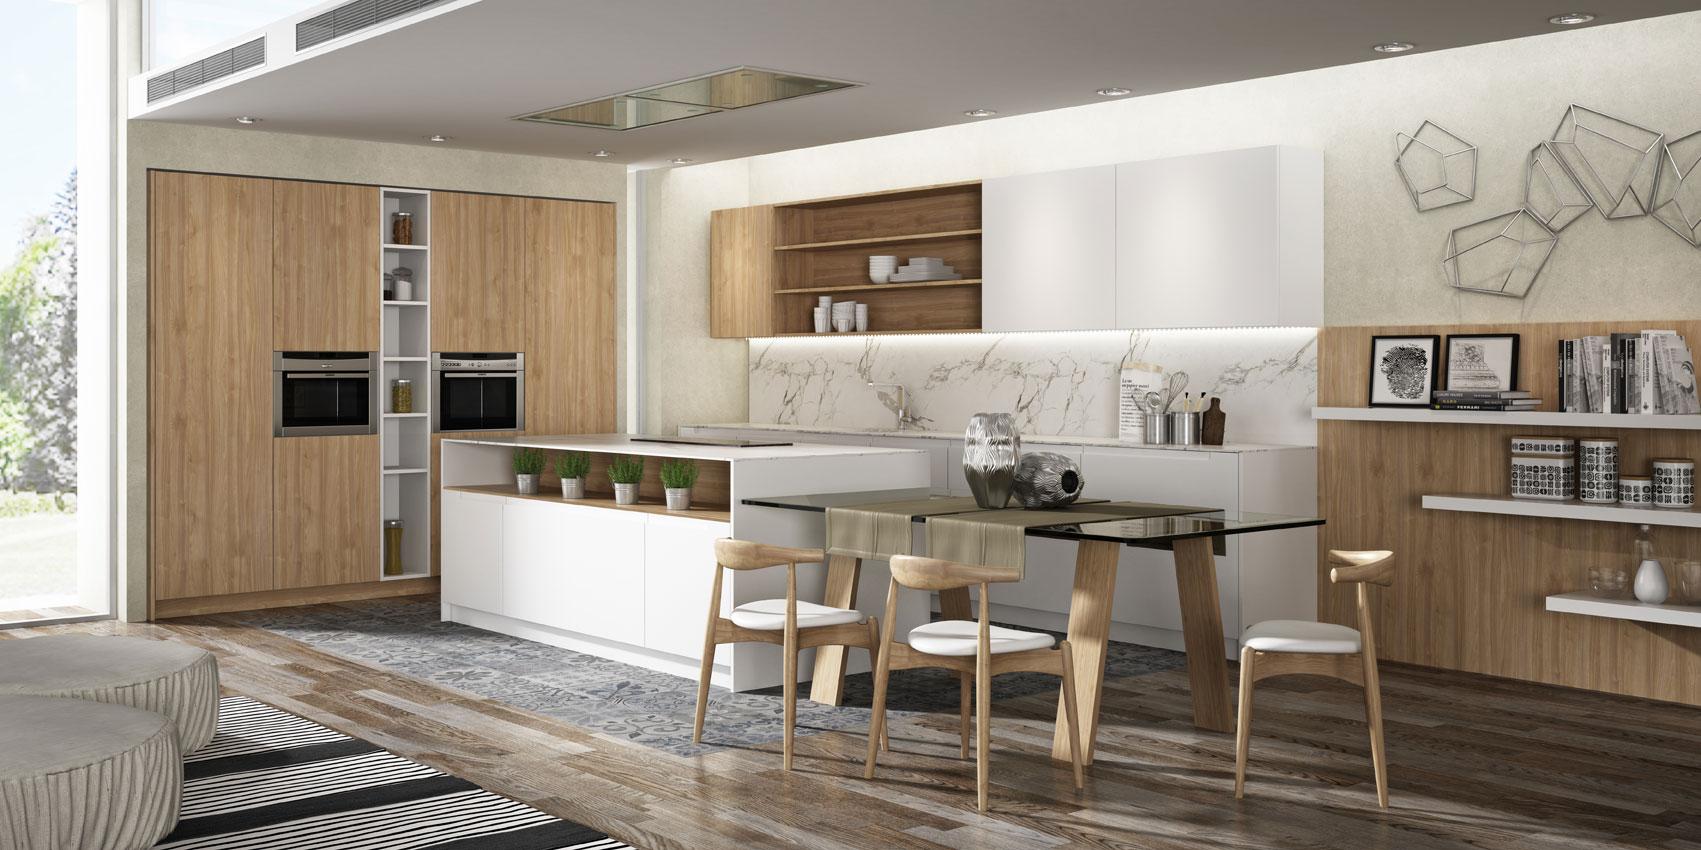 Cocina abierta dise o e instalaci n de cocinas idecocina for Modelo de cocina abierta en el comedor